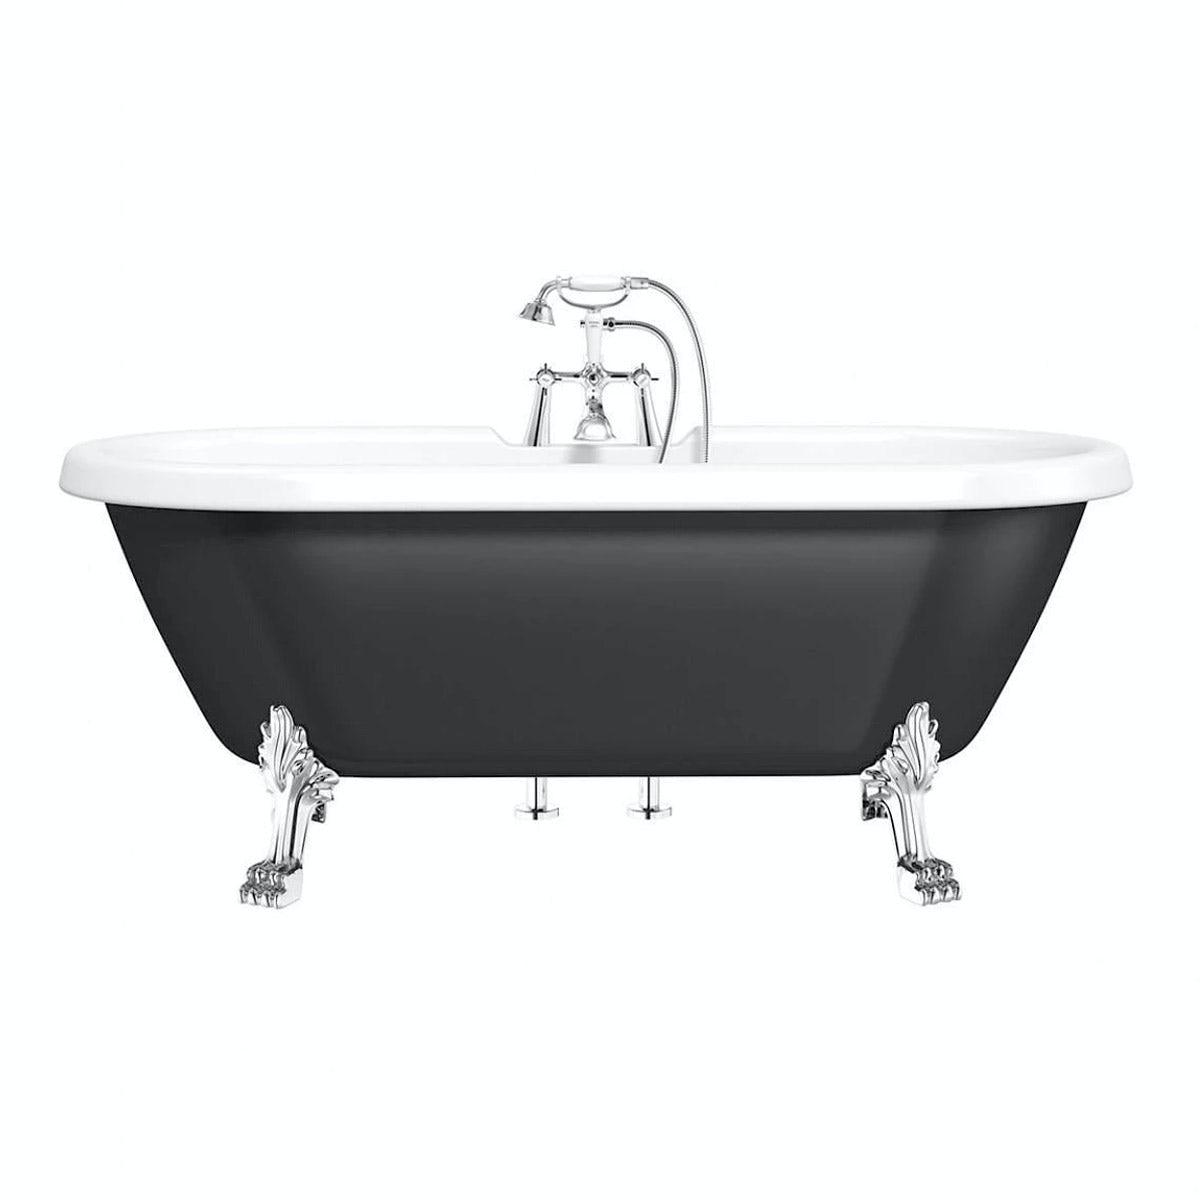 Shakespeare Black Roll Top Bath with Dragon Feet